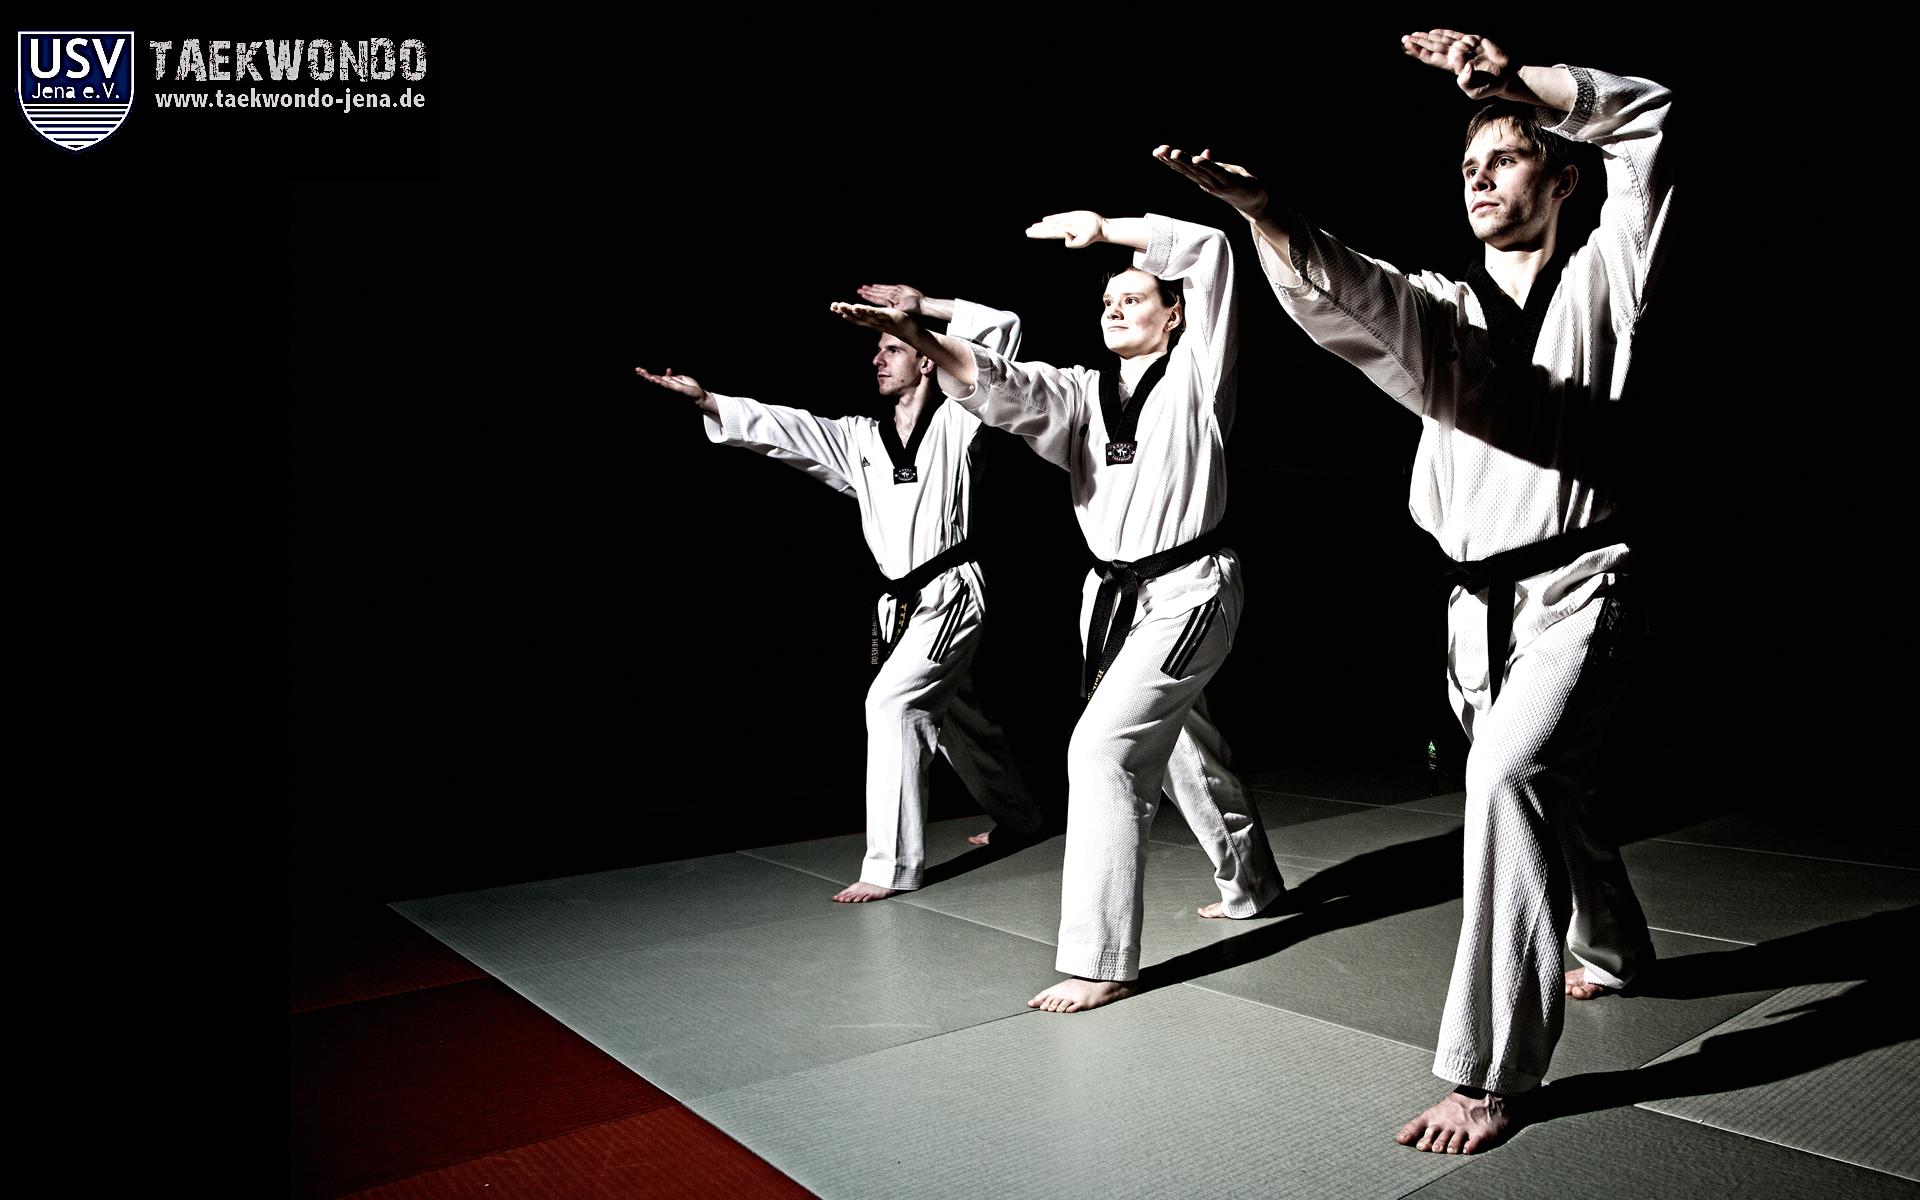 Wallpaper Toprakspor Taekwondo Kulb 1920x1200